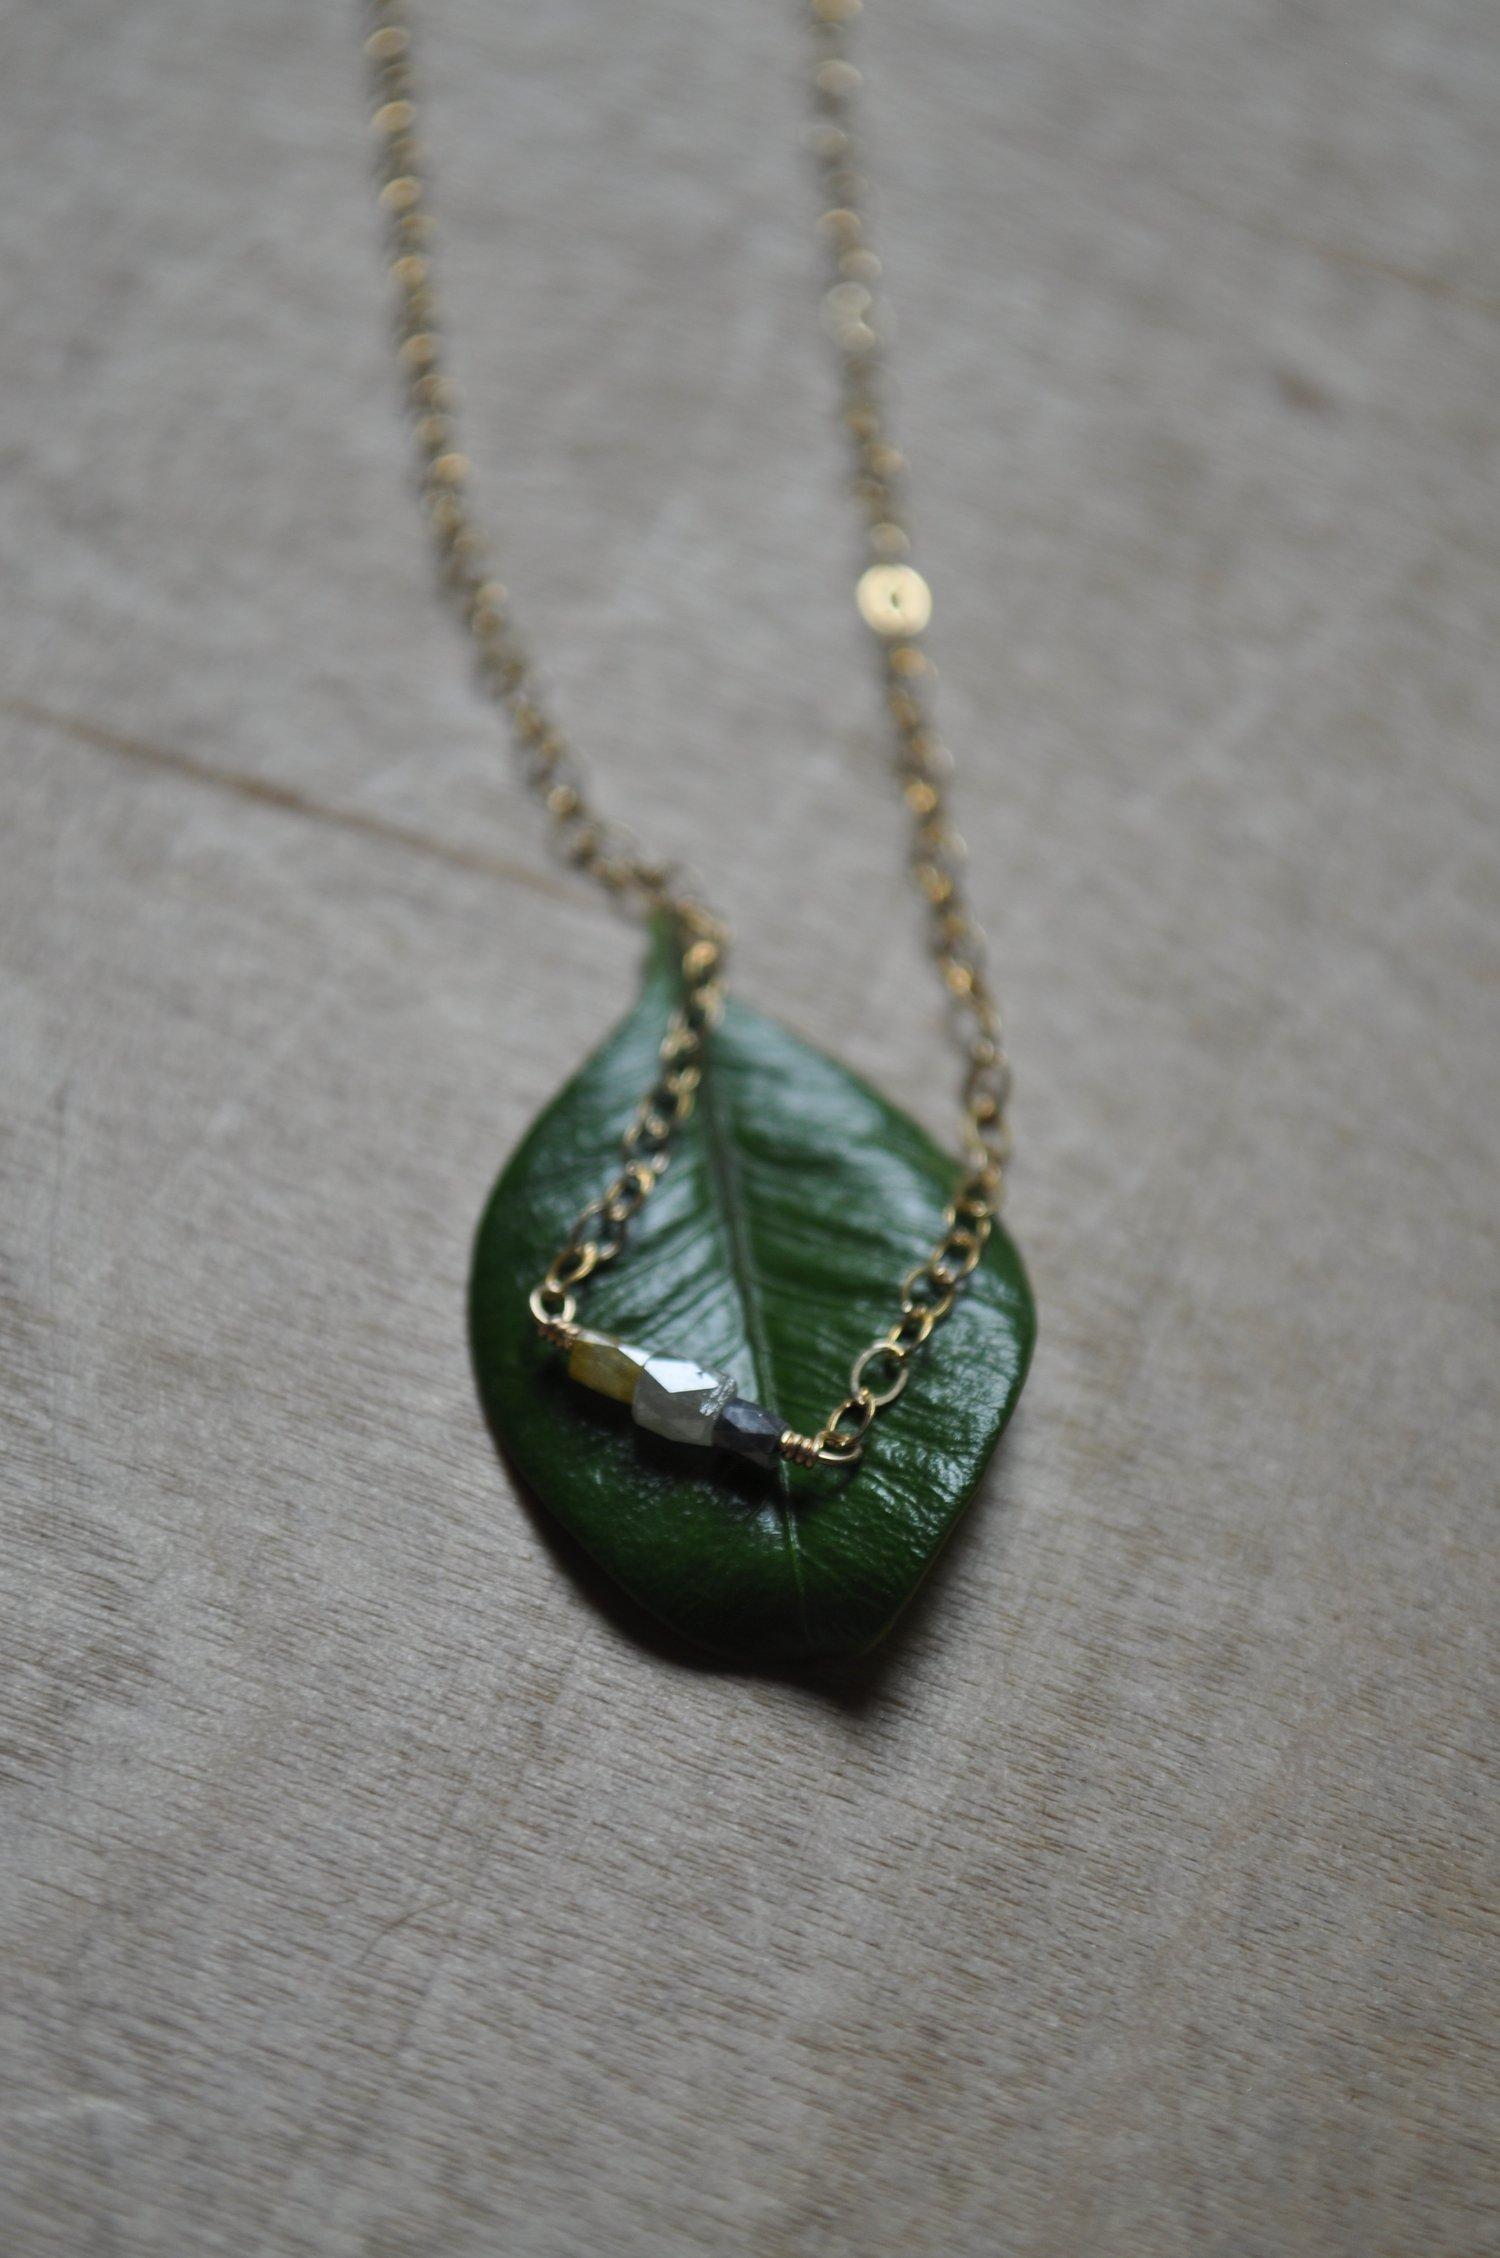 Image of Teeny Tiny Natural Diamond Trio Necklace